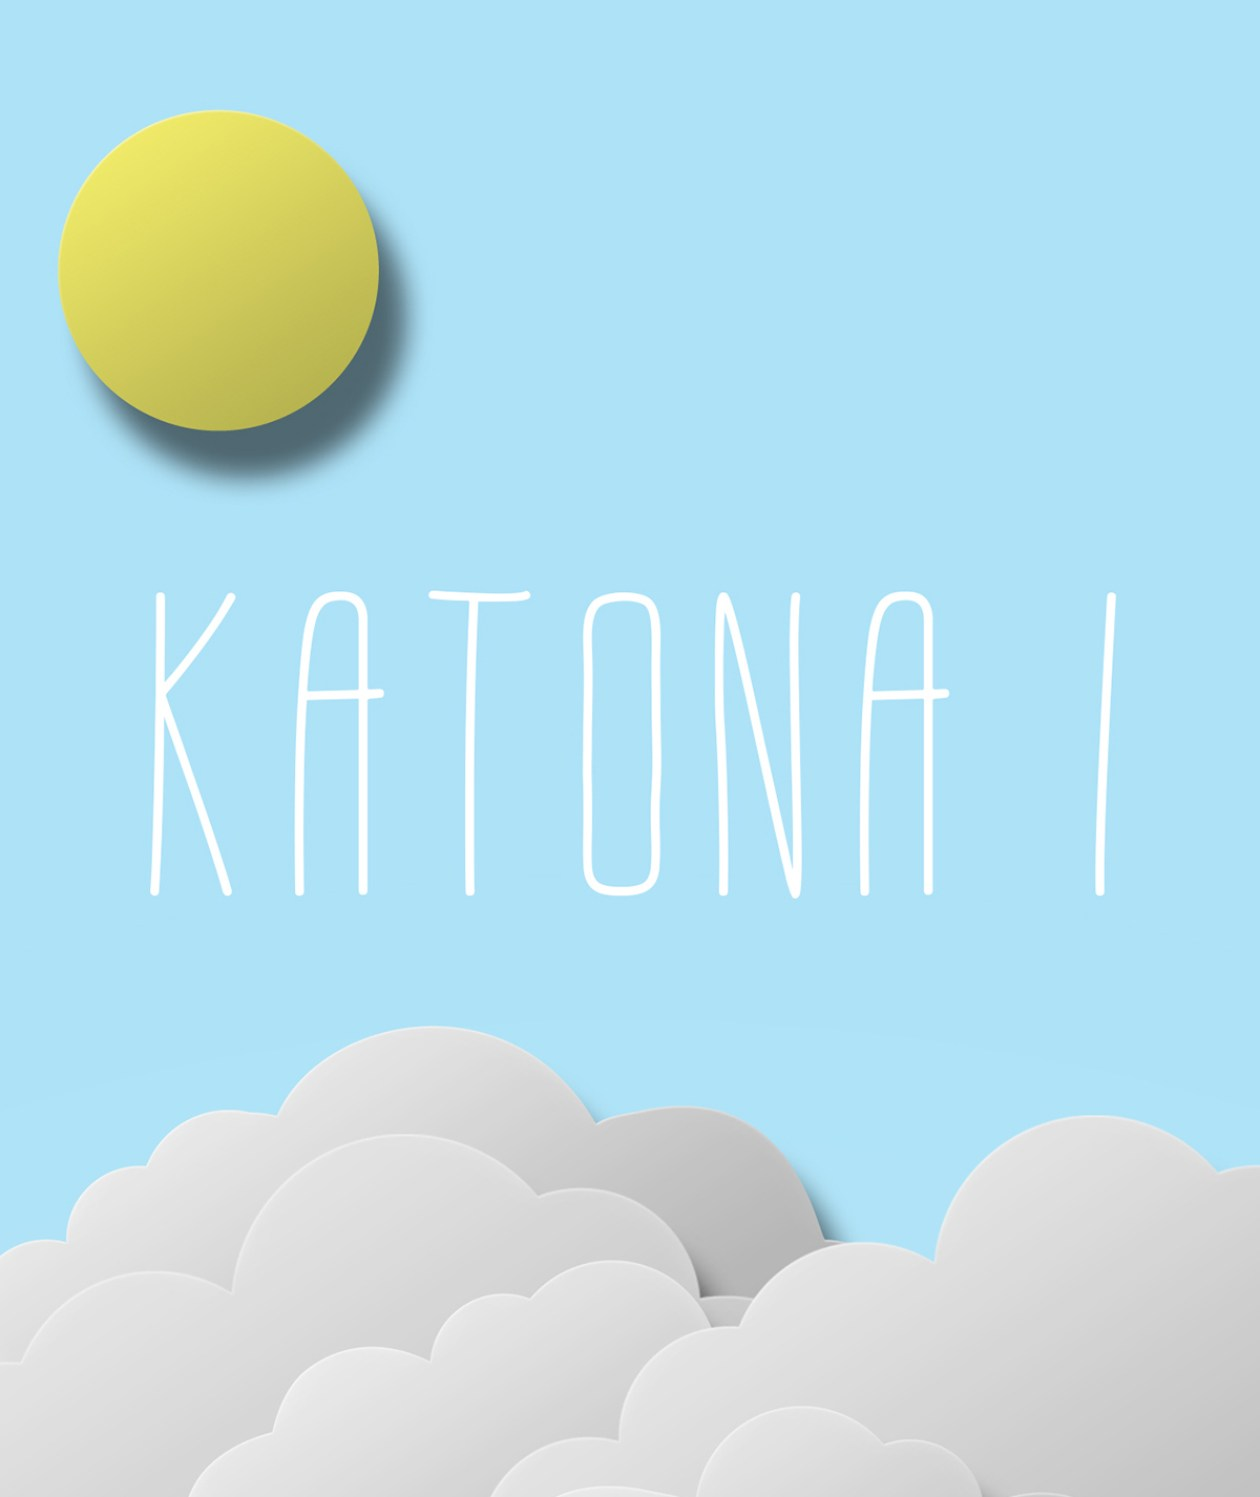 https://fontclarity.com/wp-content/uploads/2019/09/katona-i-download-0.jpg Free Download